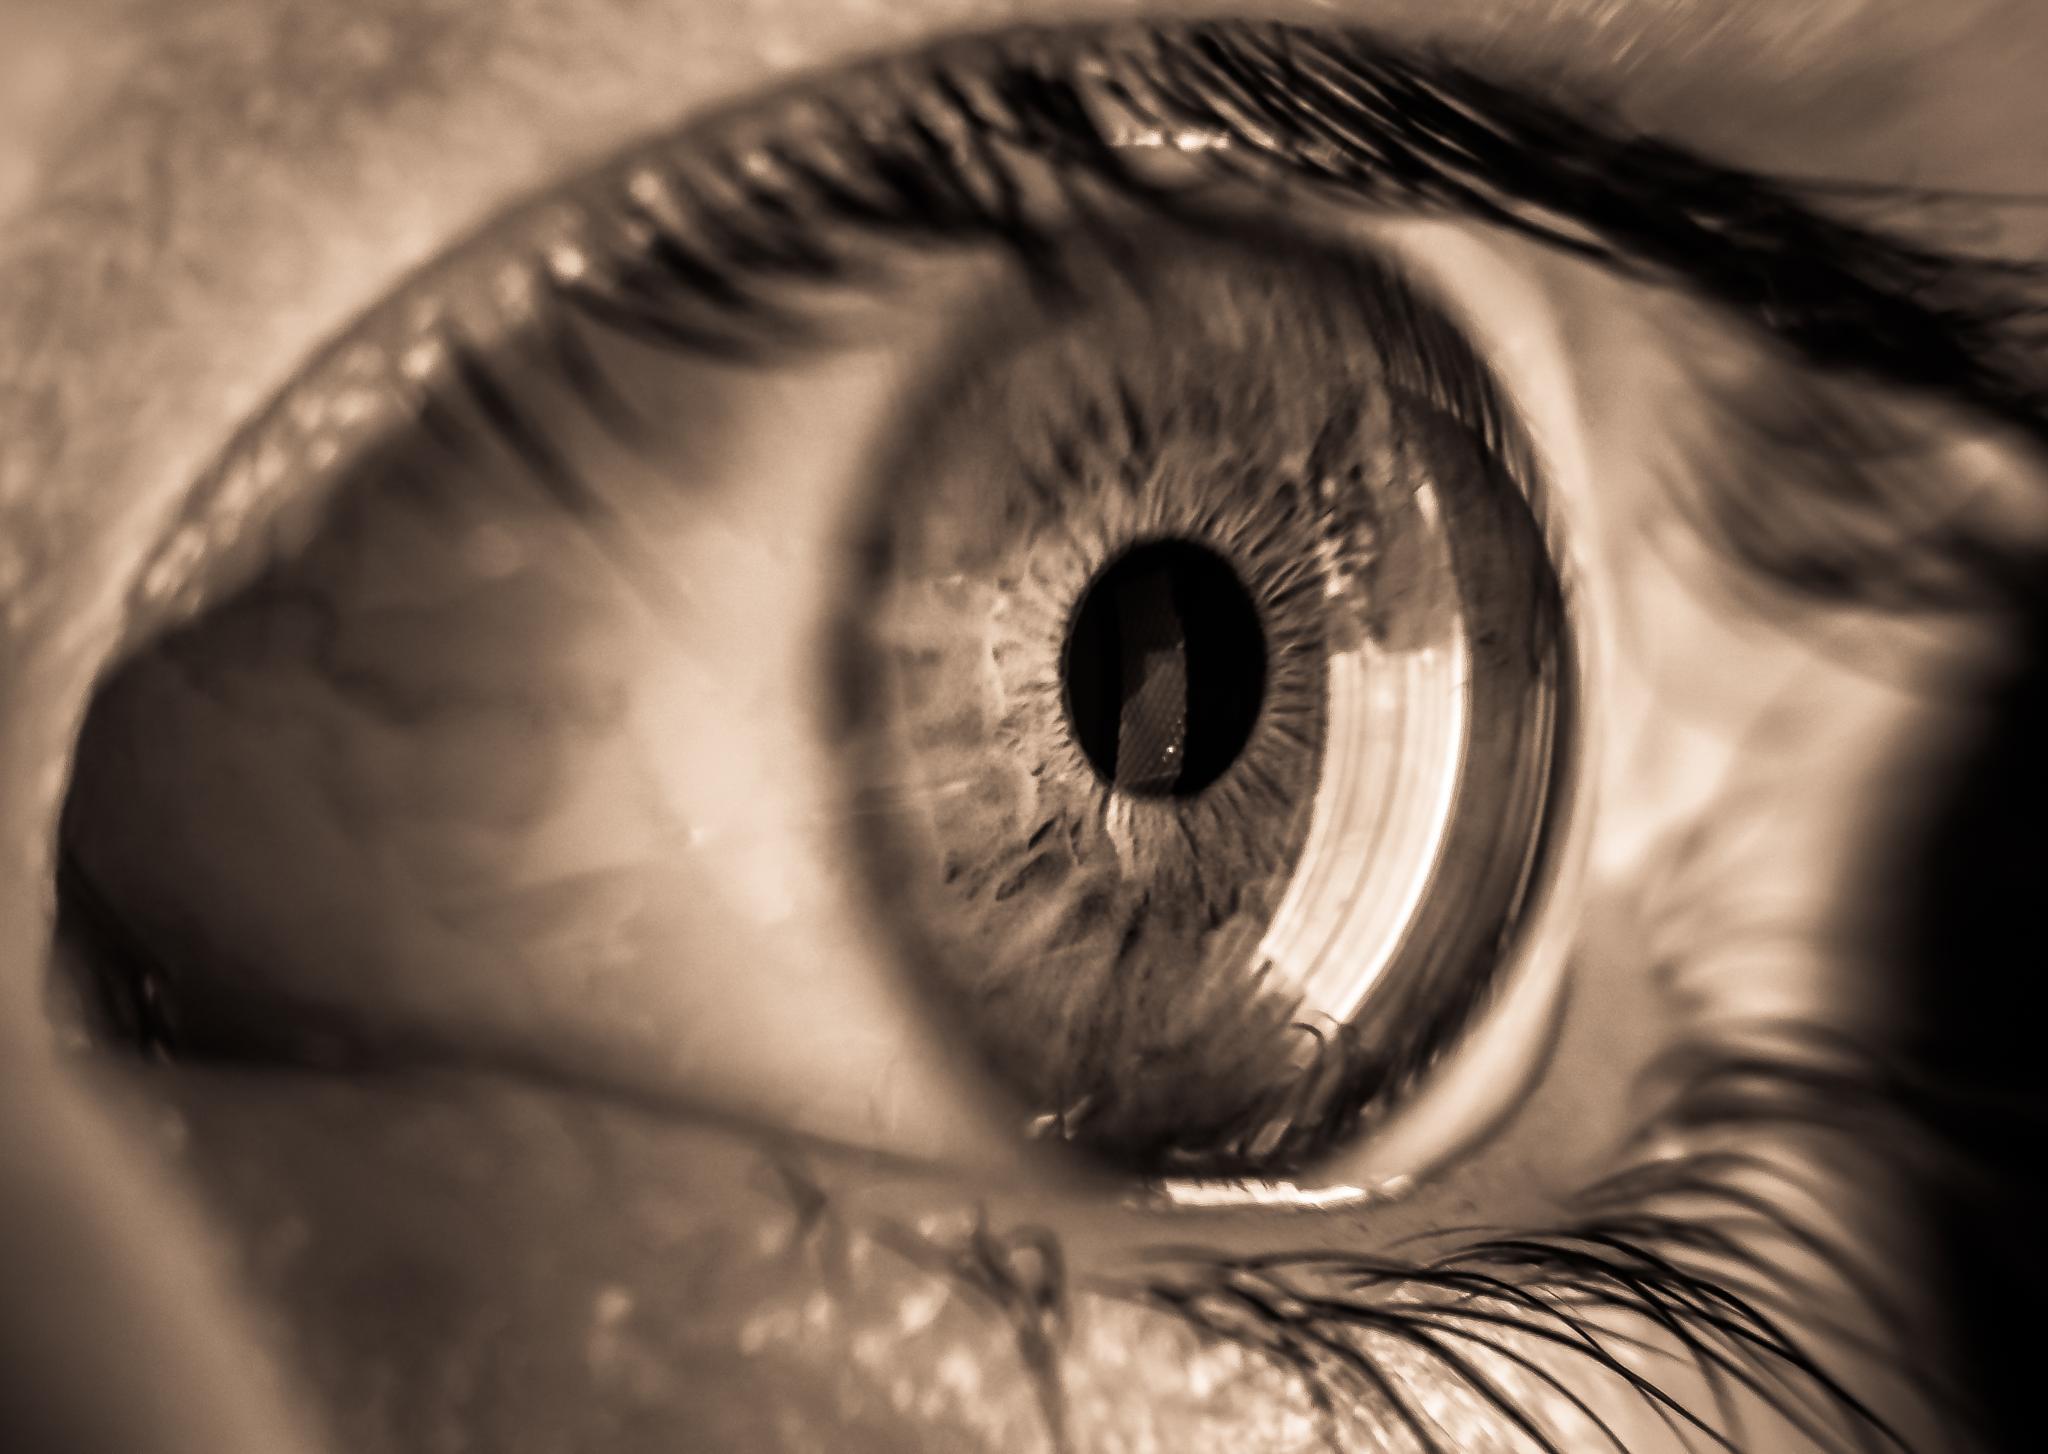 Adams eye by Leanne Smithers